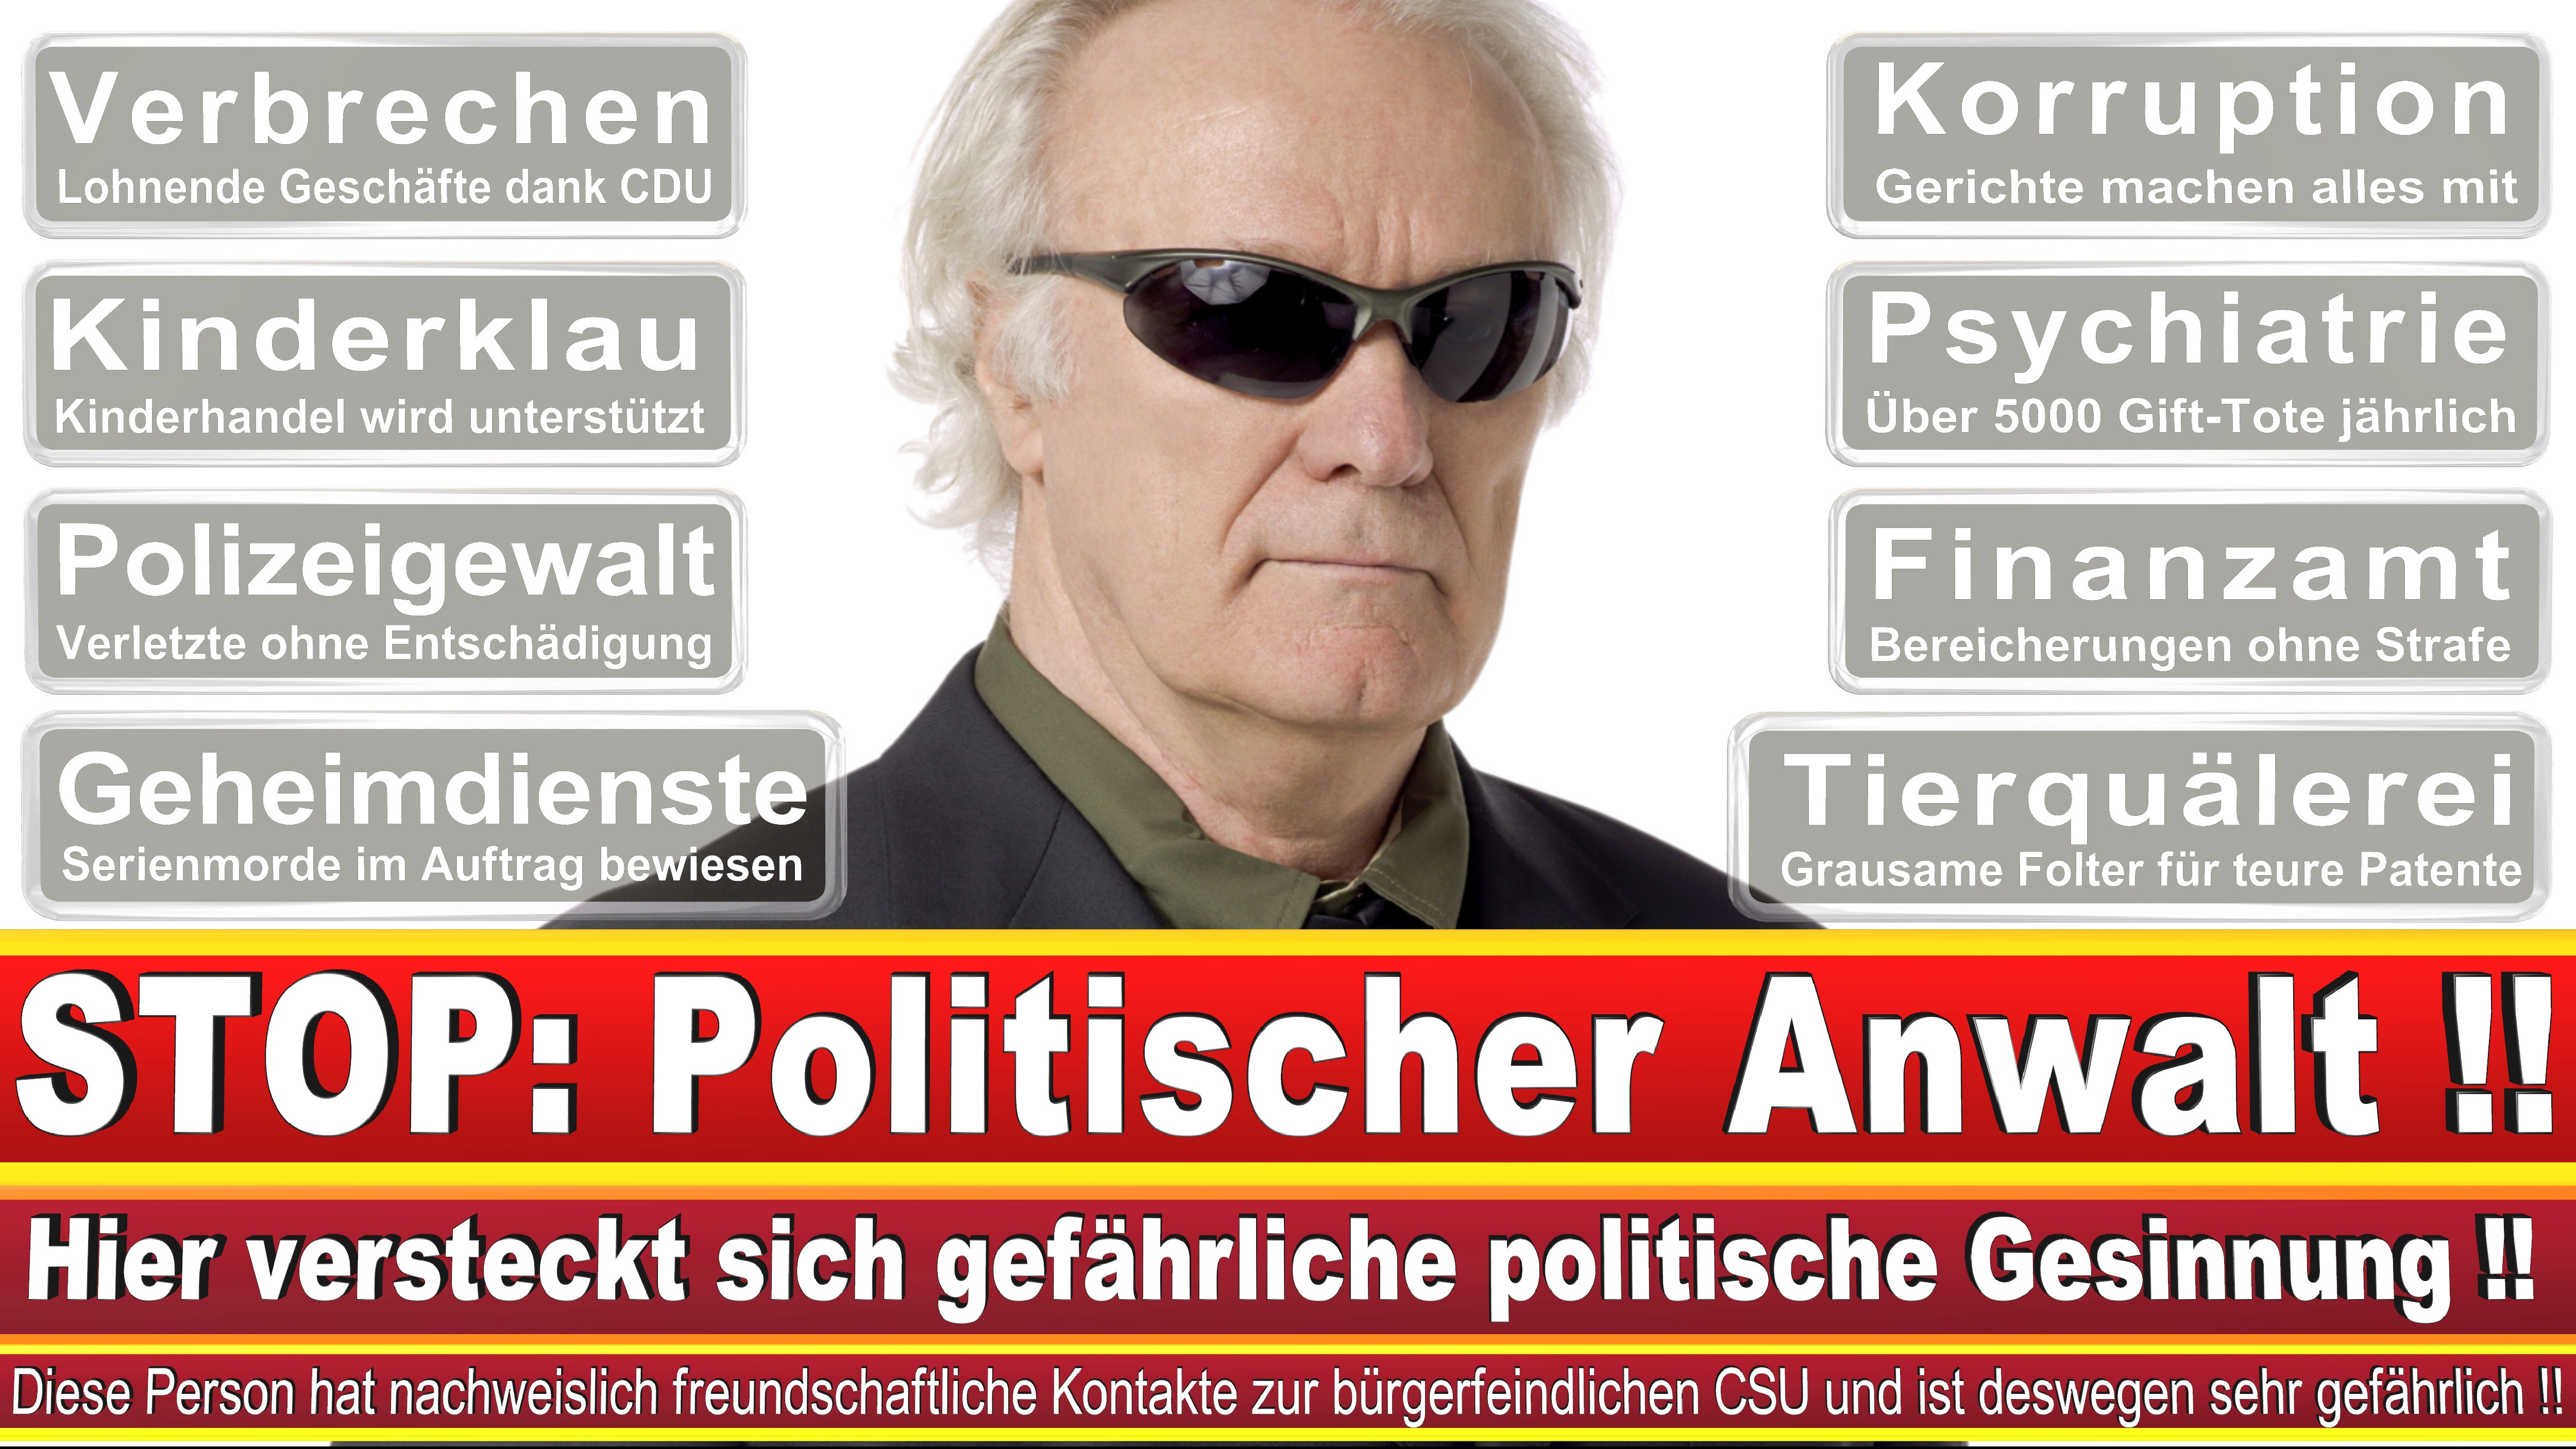 Rechtsanwalt Christoph Sorg München Angestellt Rechtsanwalt Schultze Braun Rechtsanwaltsgesellschaft